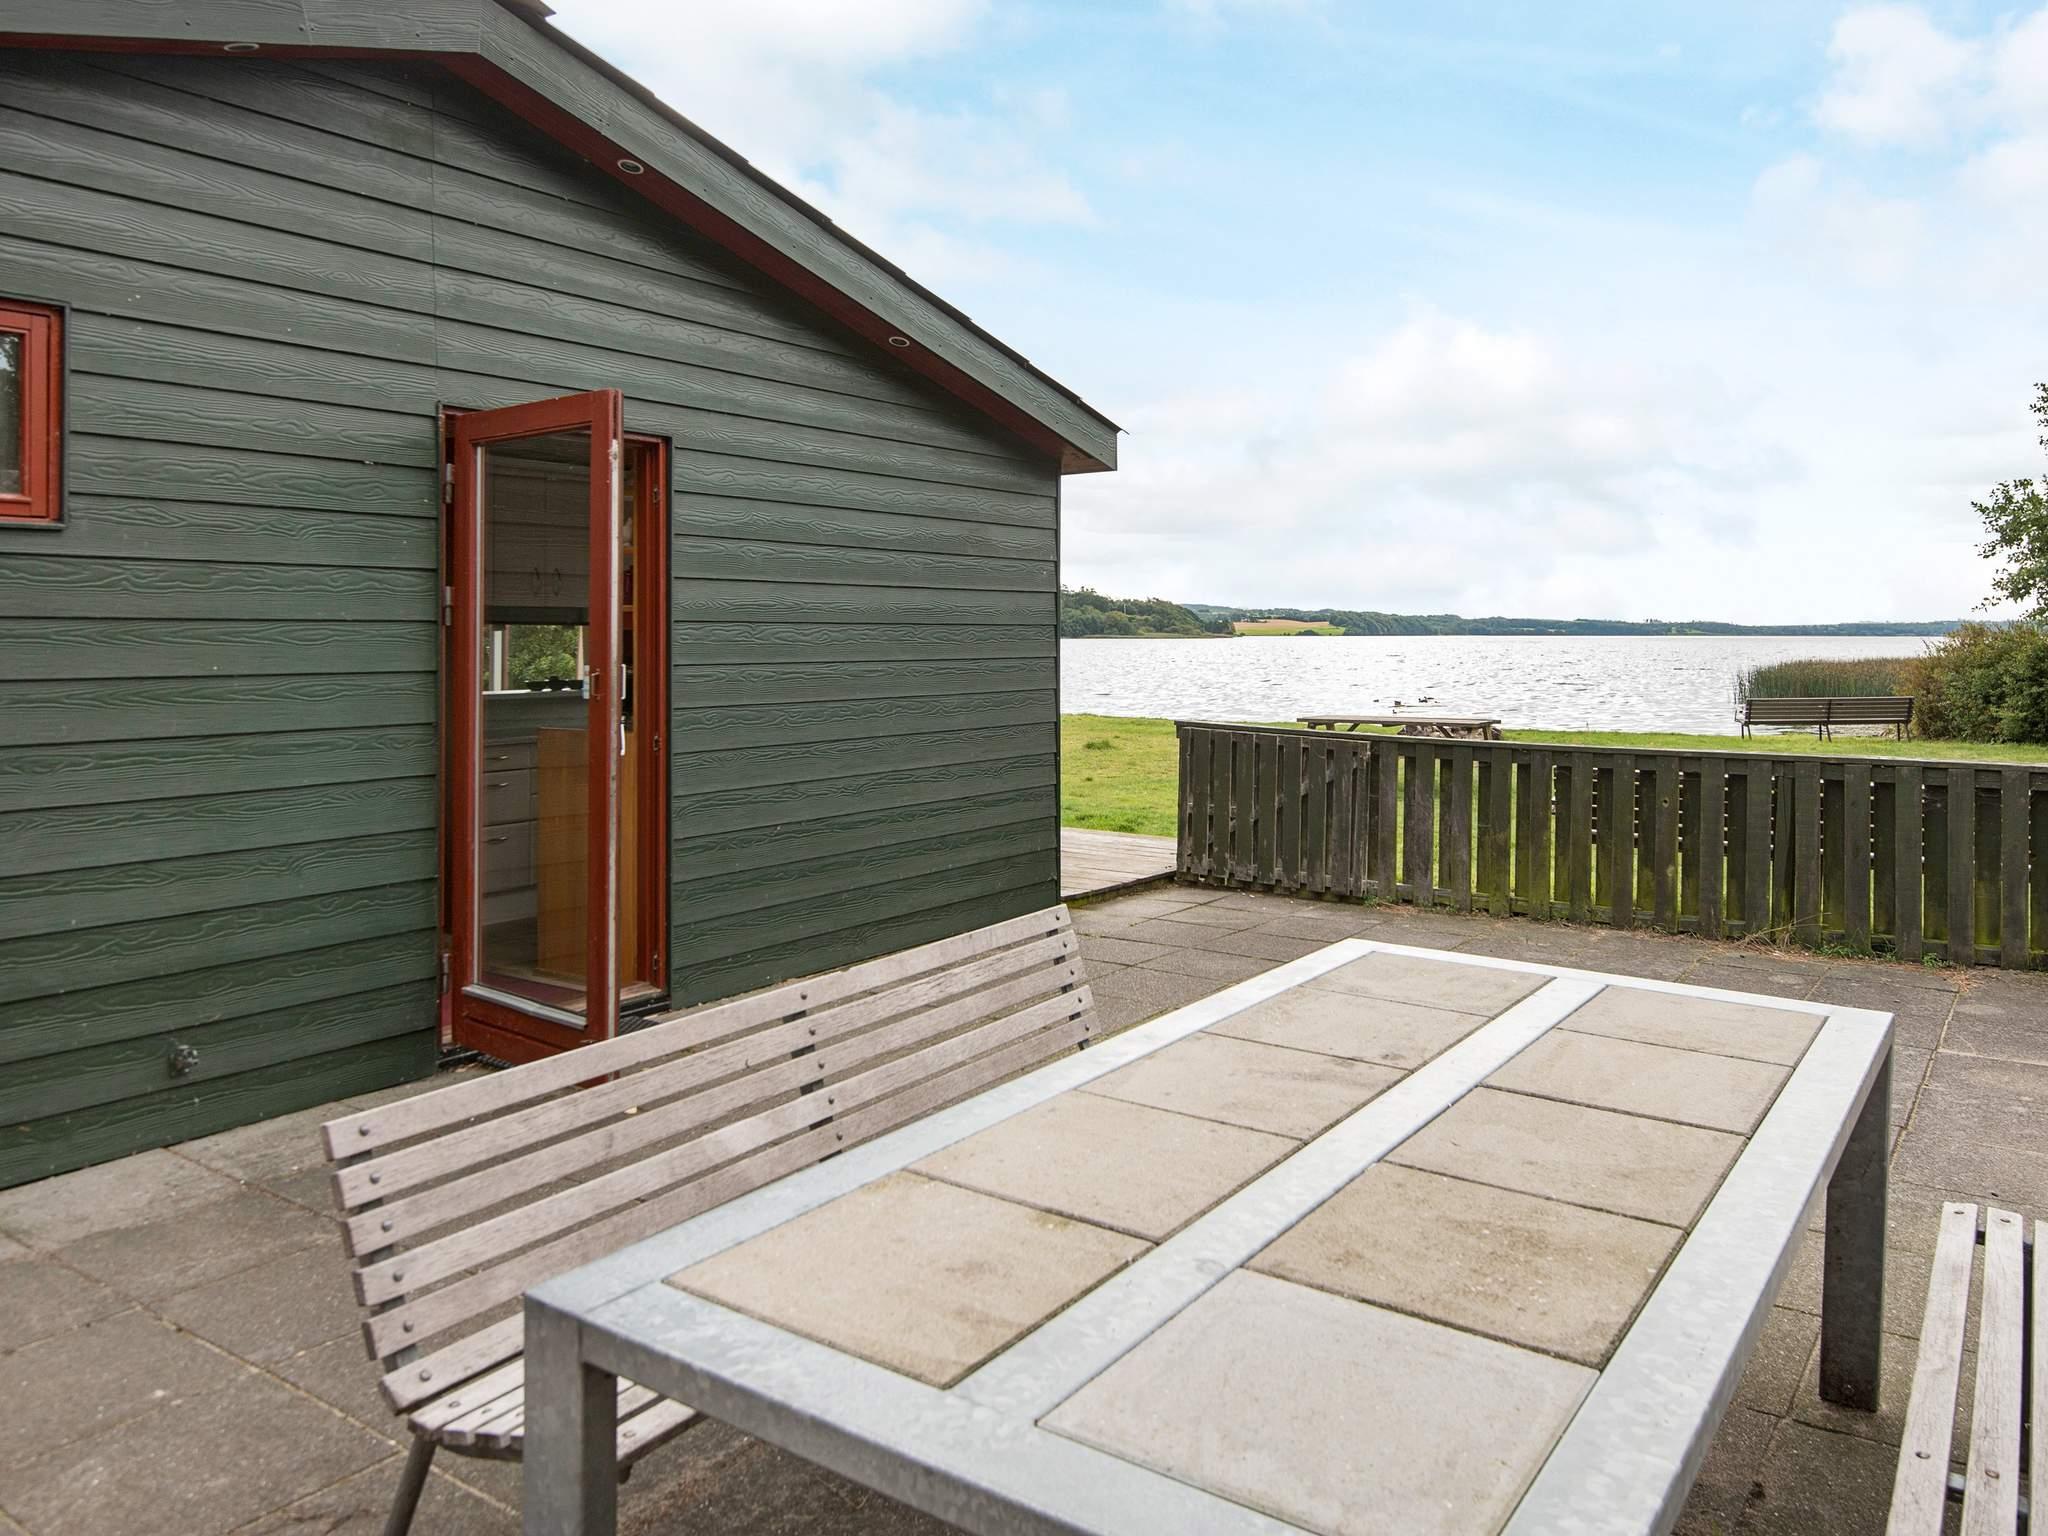 Ferienhaus Mossø (84515), Skanderborg, , Dänische Ostsee, Dänemark, Bild 26